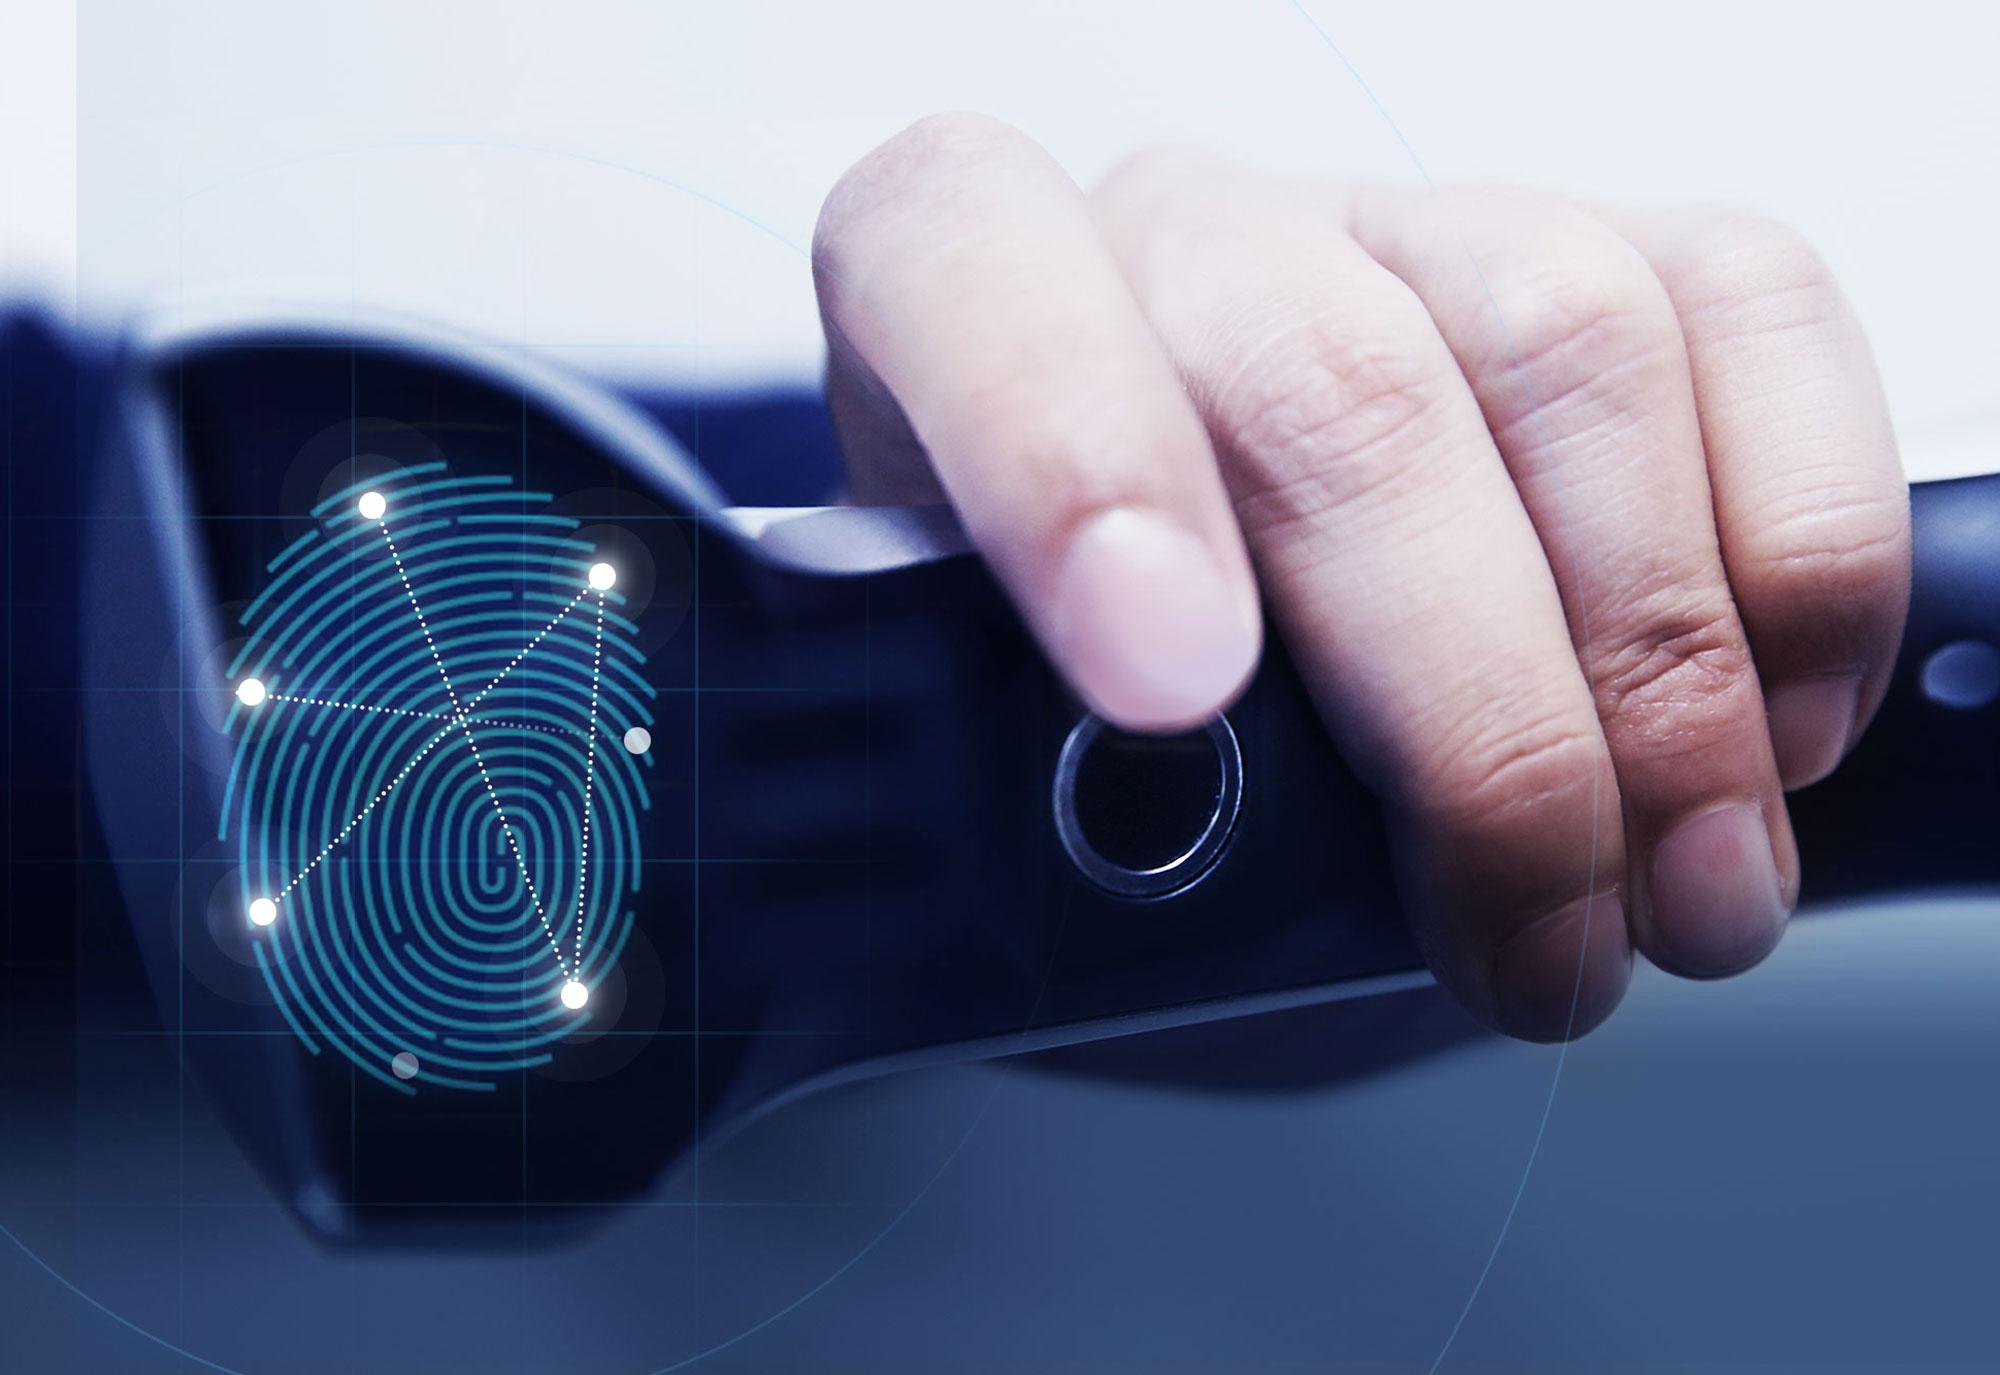 Hyundai-fingerprint-technology_press-photo2.jpg